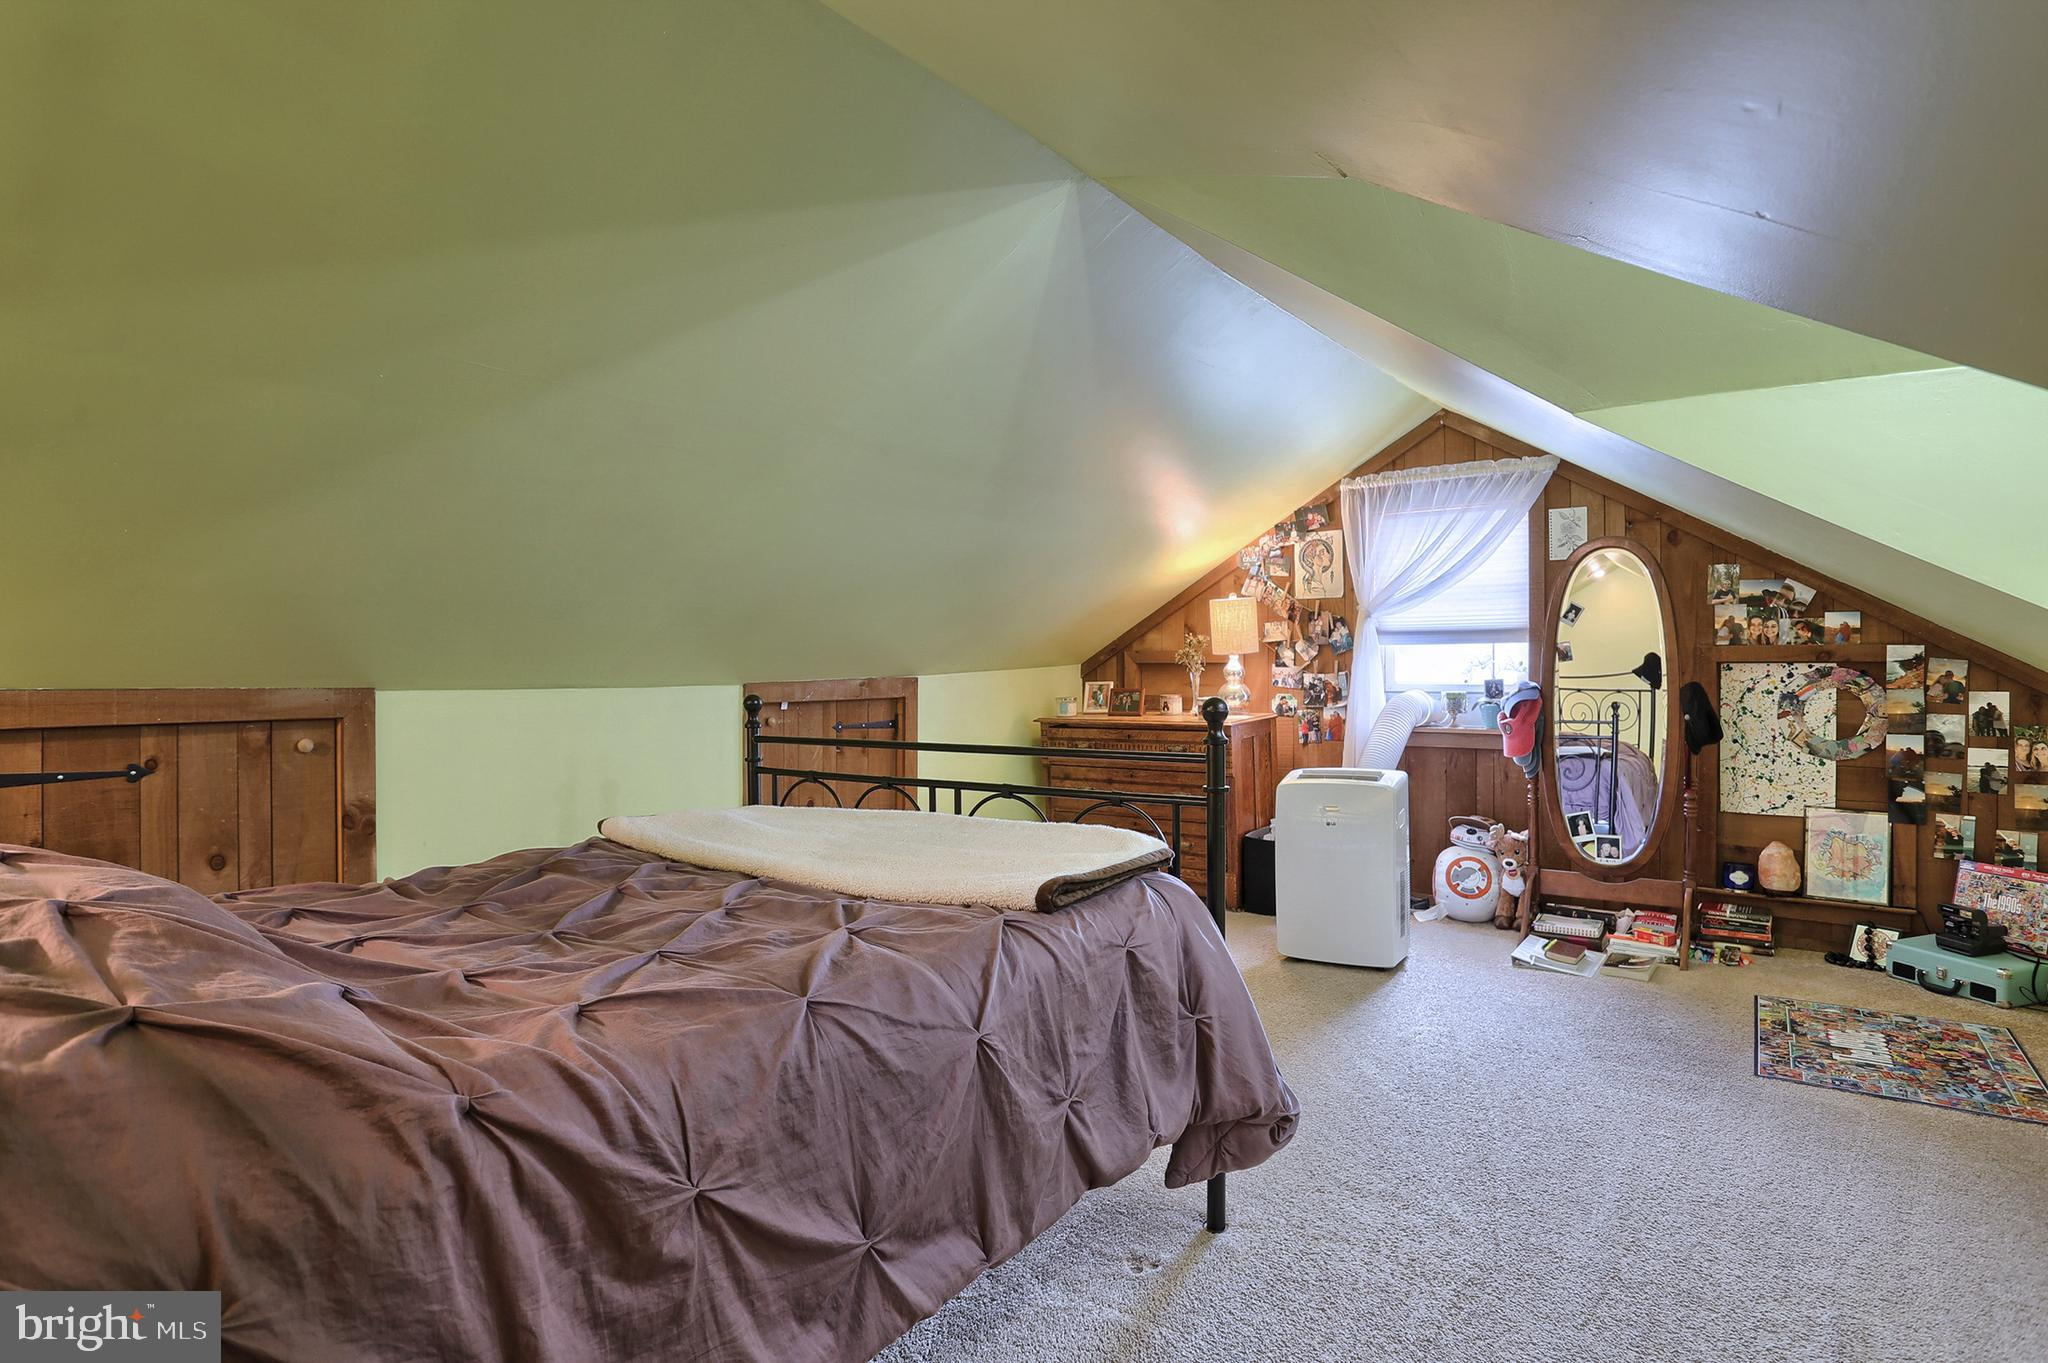 Attic 5th Bedroom - No Heat